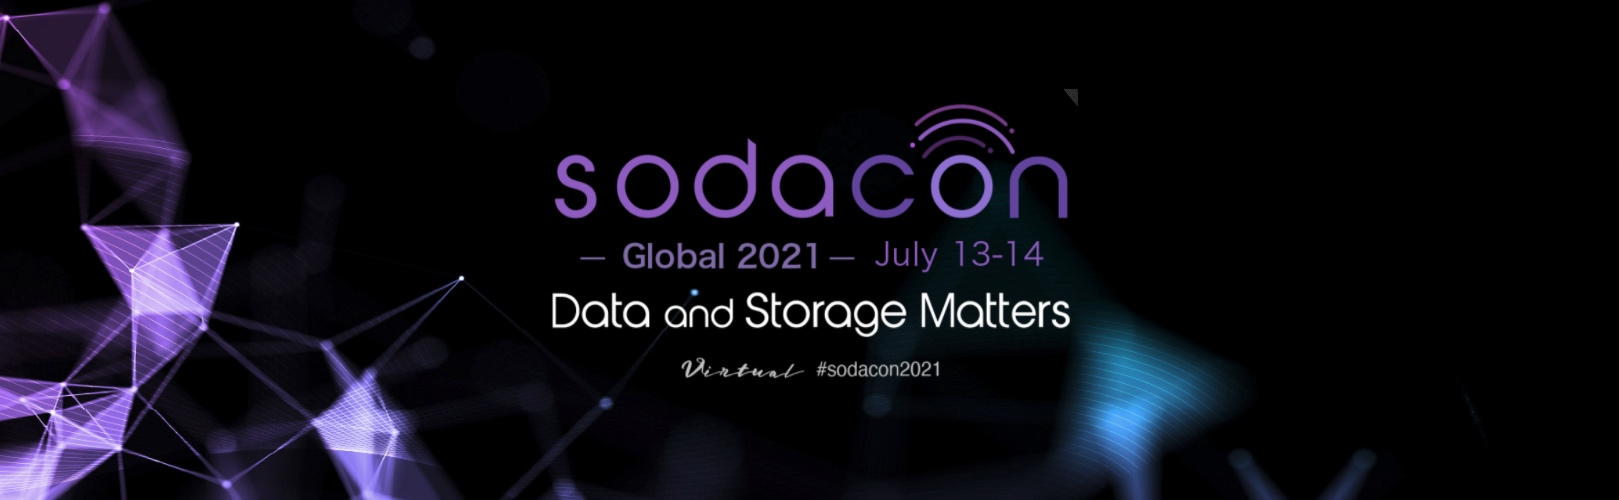 SODACON Global 2021